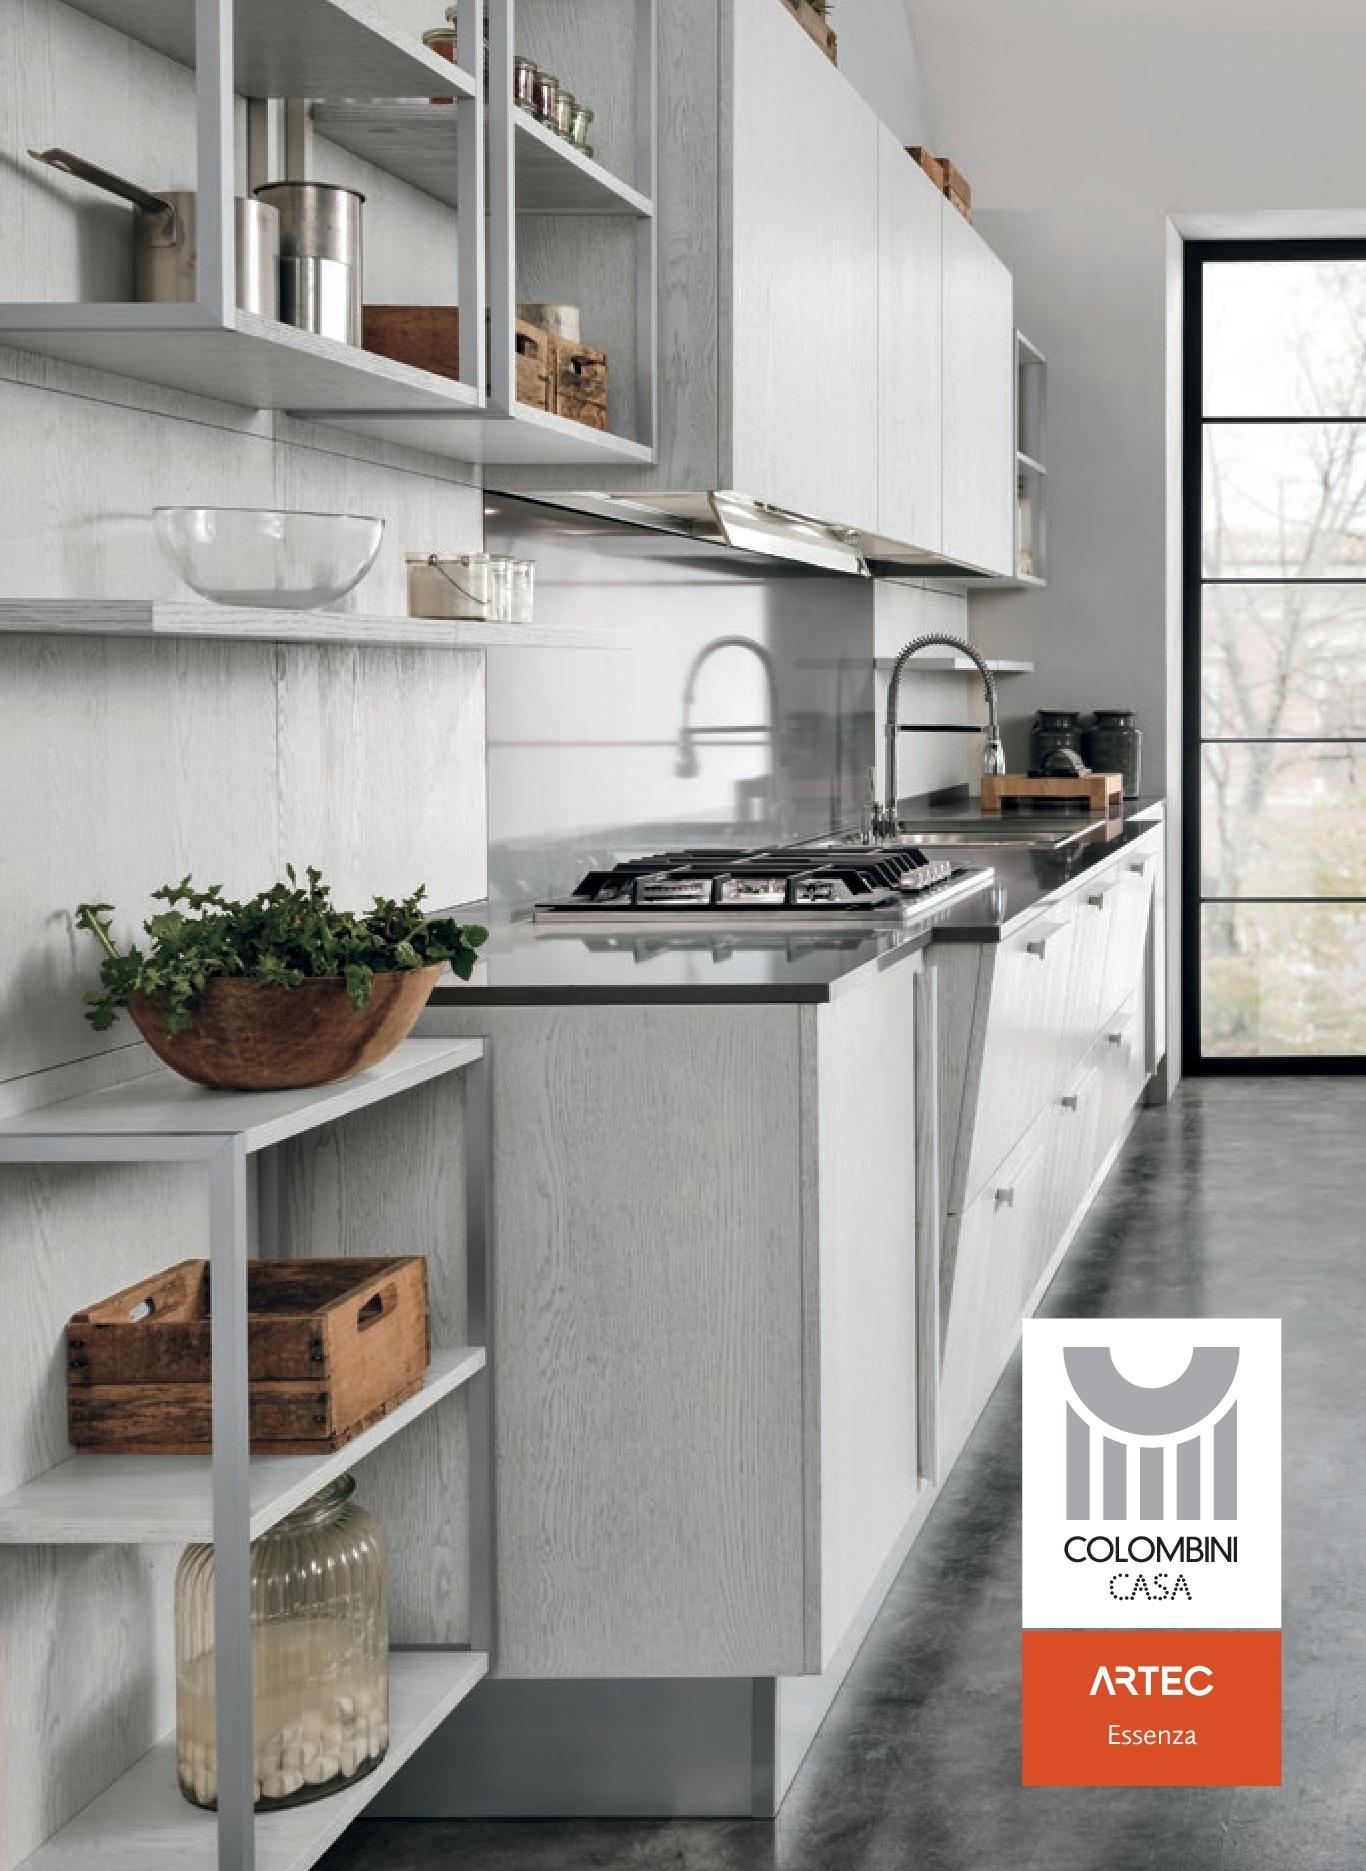 Cucine Artec Colombini | Cucina Quadra 28 Images Cucina Completa Ala ...